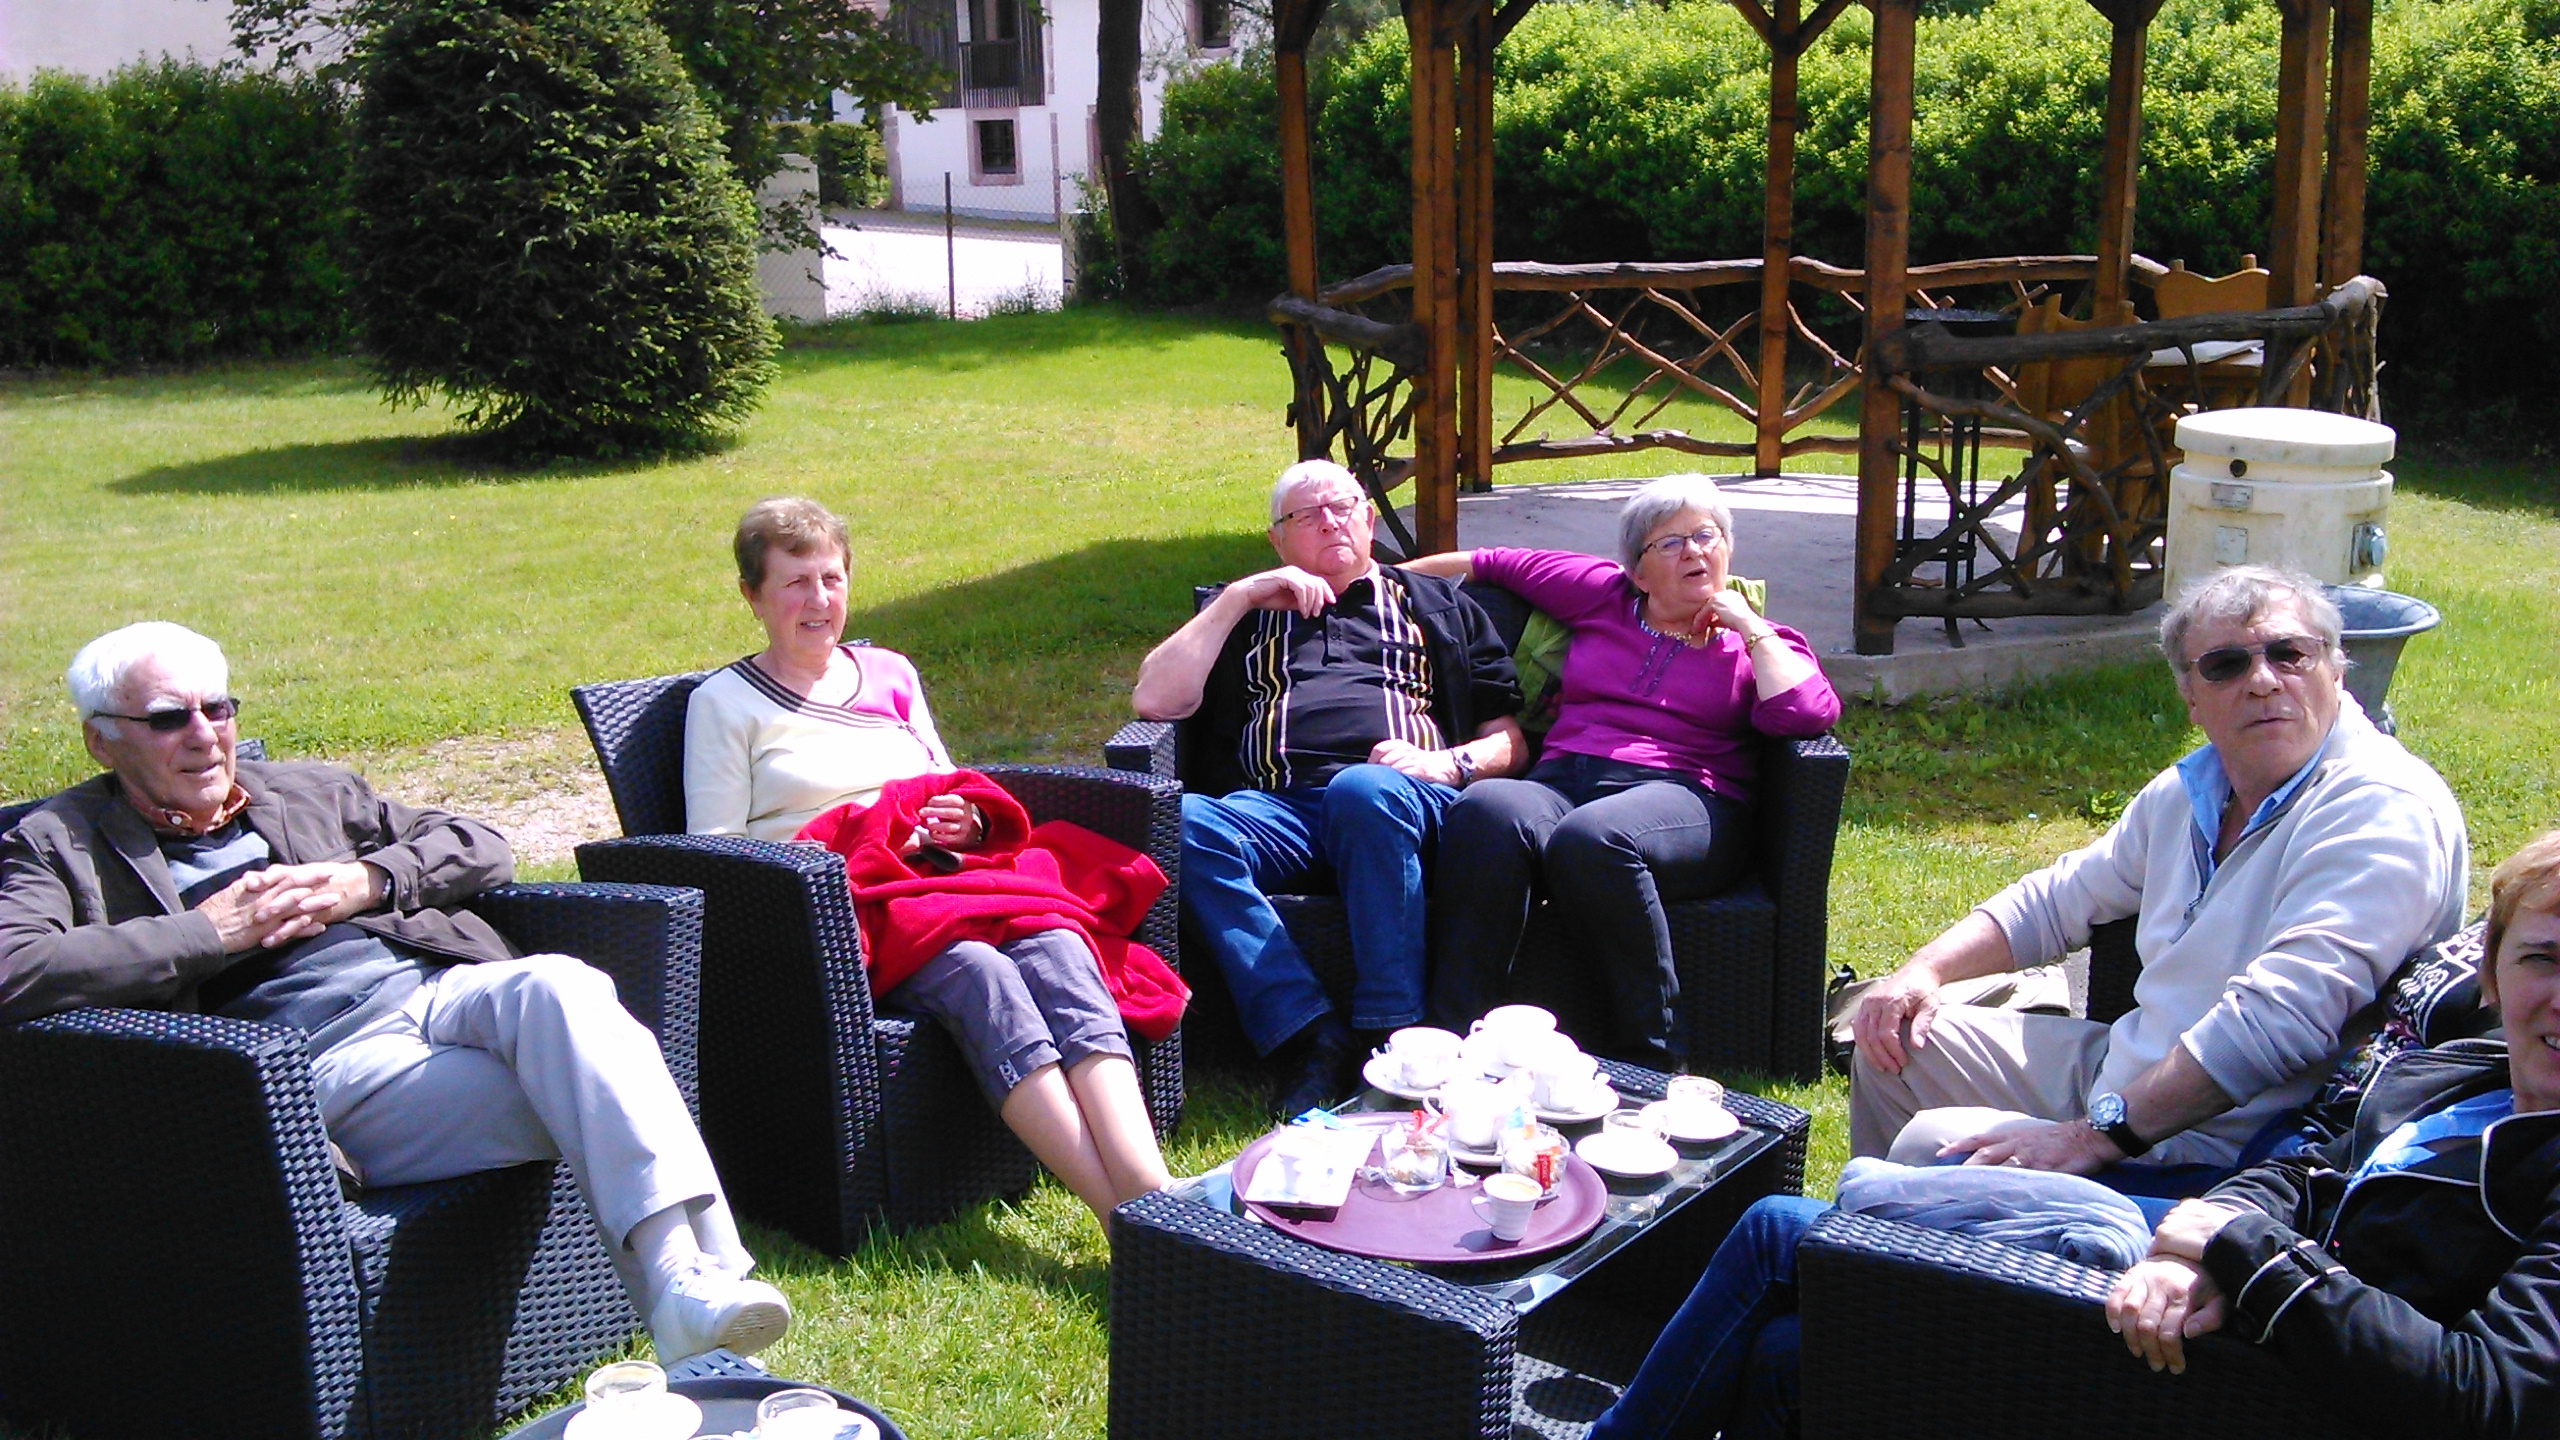 Sortie au jardin de berchigranges vosges argonne fan for Haut jardin rehaupal